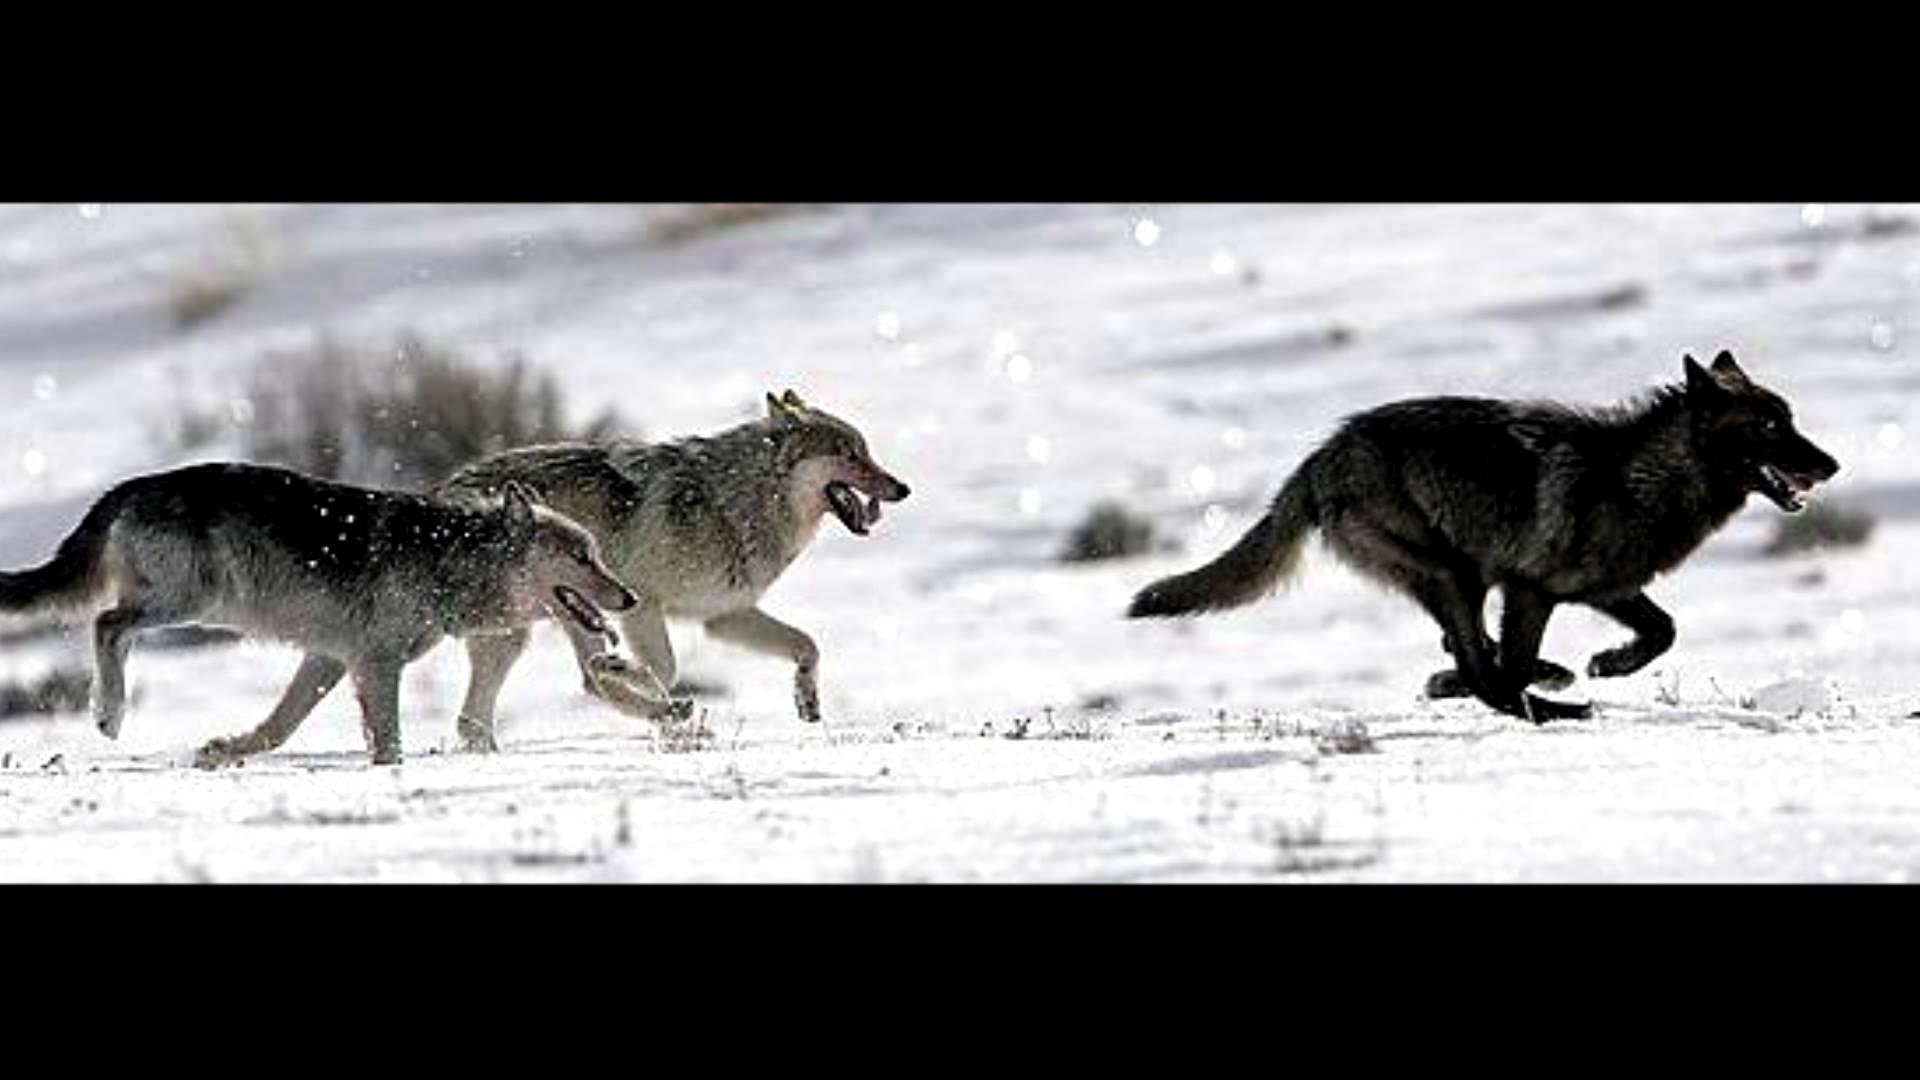 Wolf Pack running in snow Winter scenic on cottonVIP design